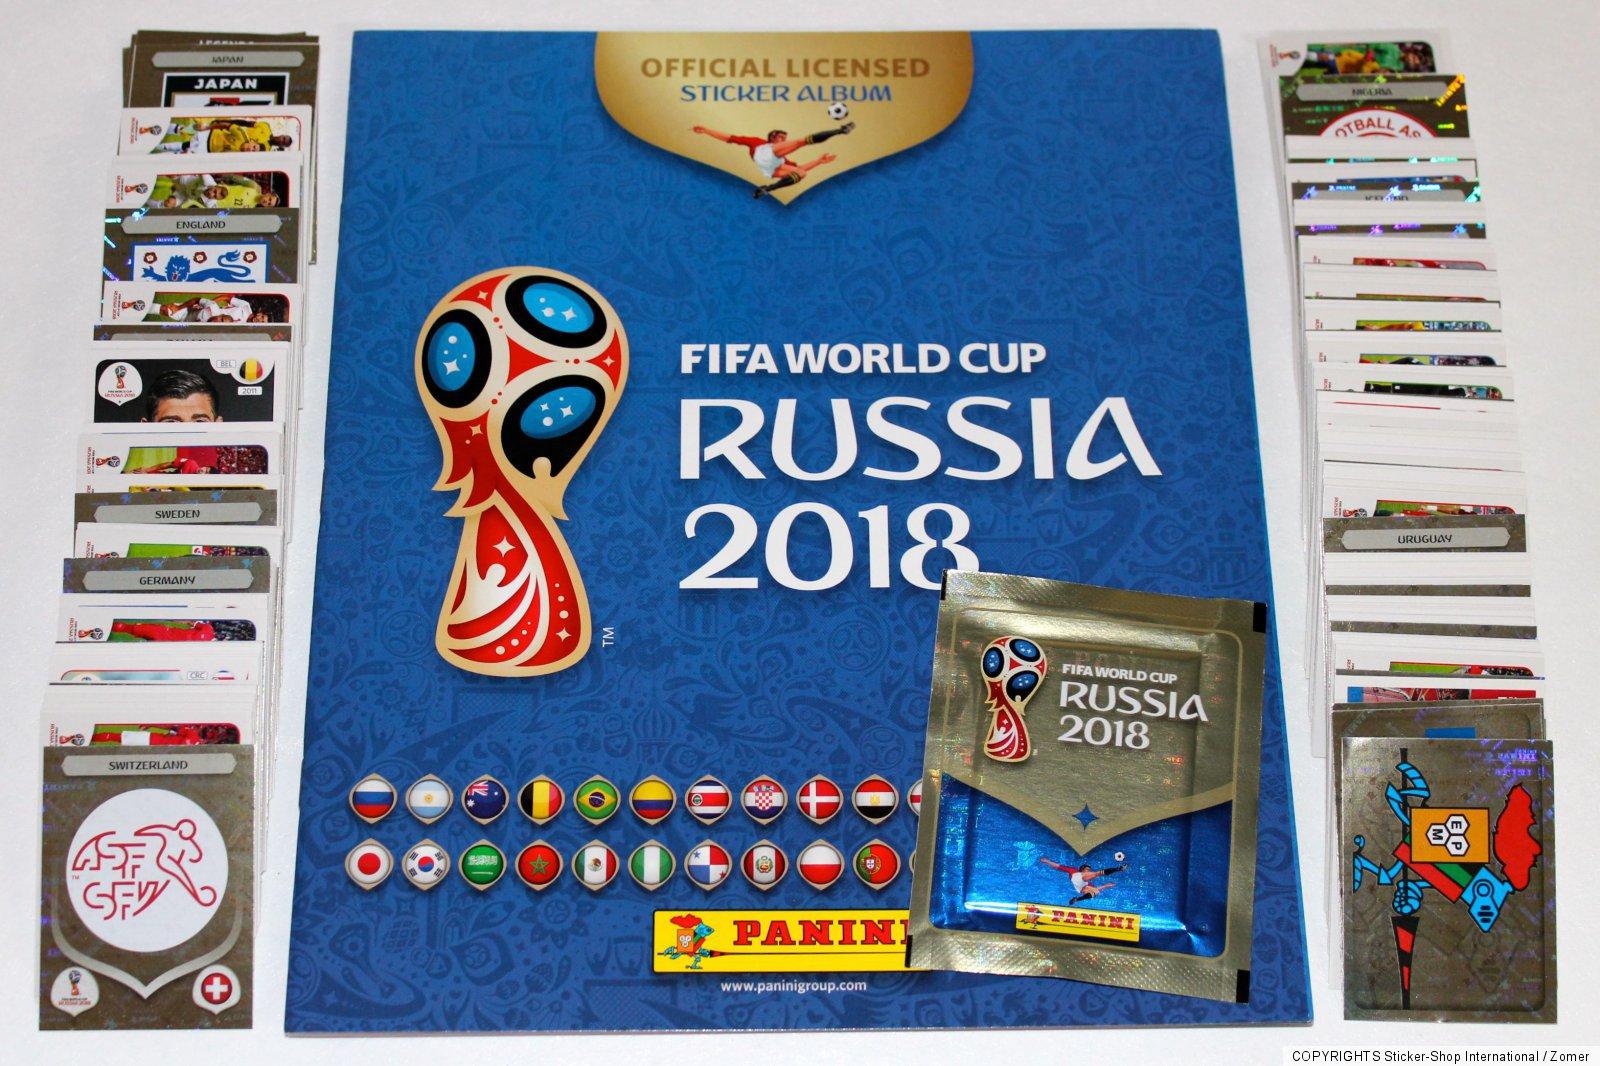 PANINI EMPTY ALBUM VIDE 100 POCHETTES BUSTINA FOOT WORLD CUP RUSSIA 2018 NEUF